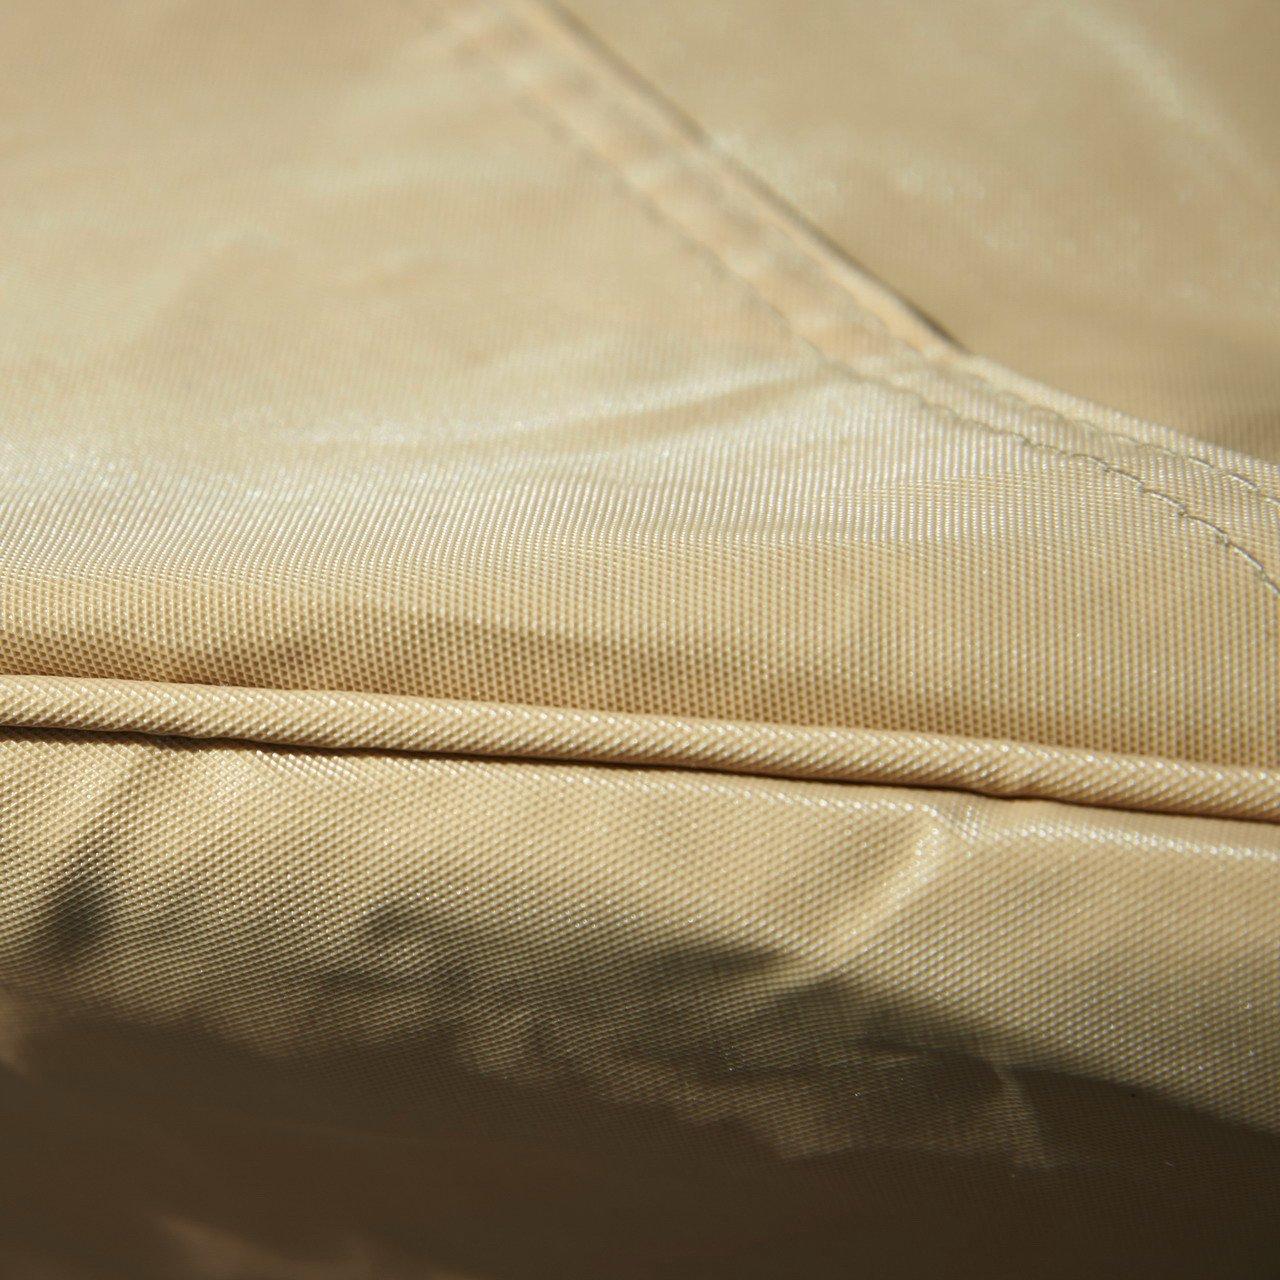 Seasons Sentry CVP01437 Premium Patio Heater Cover Sand